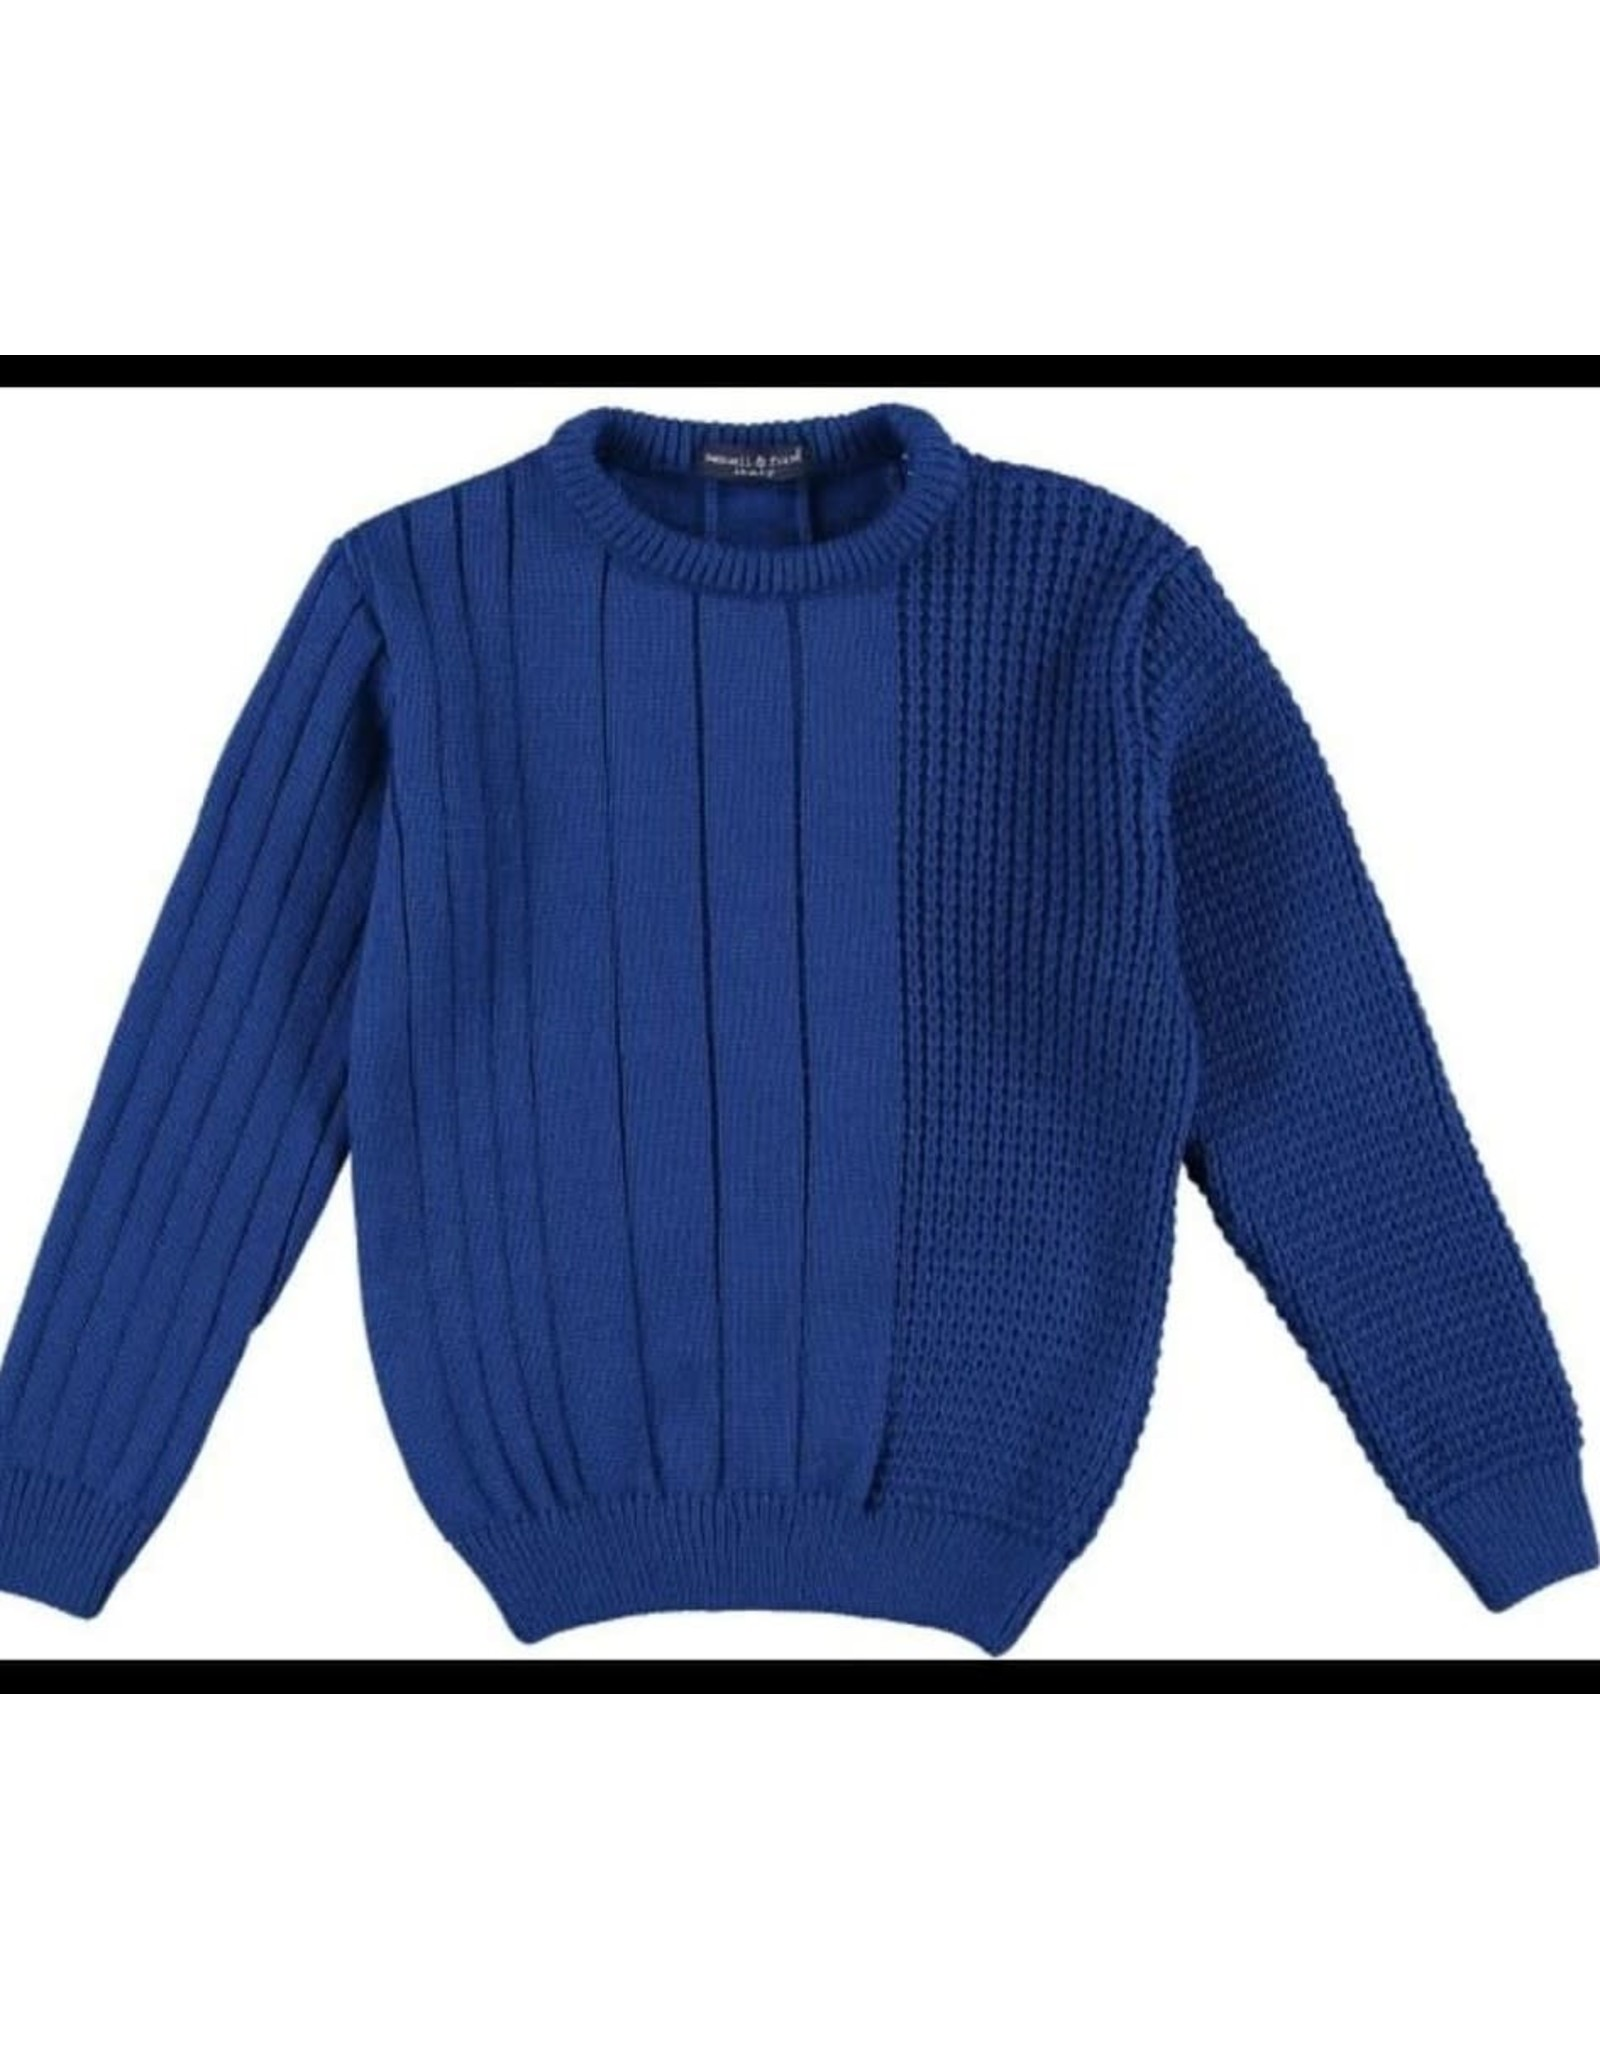 Manuell & frank Pullover knit hoogblauw